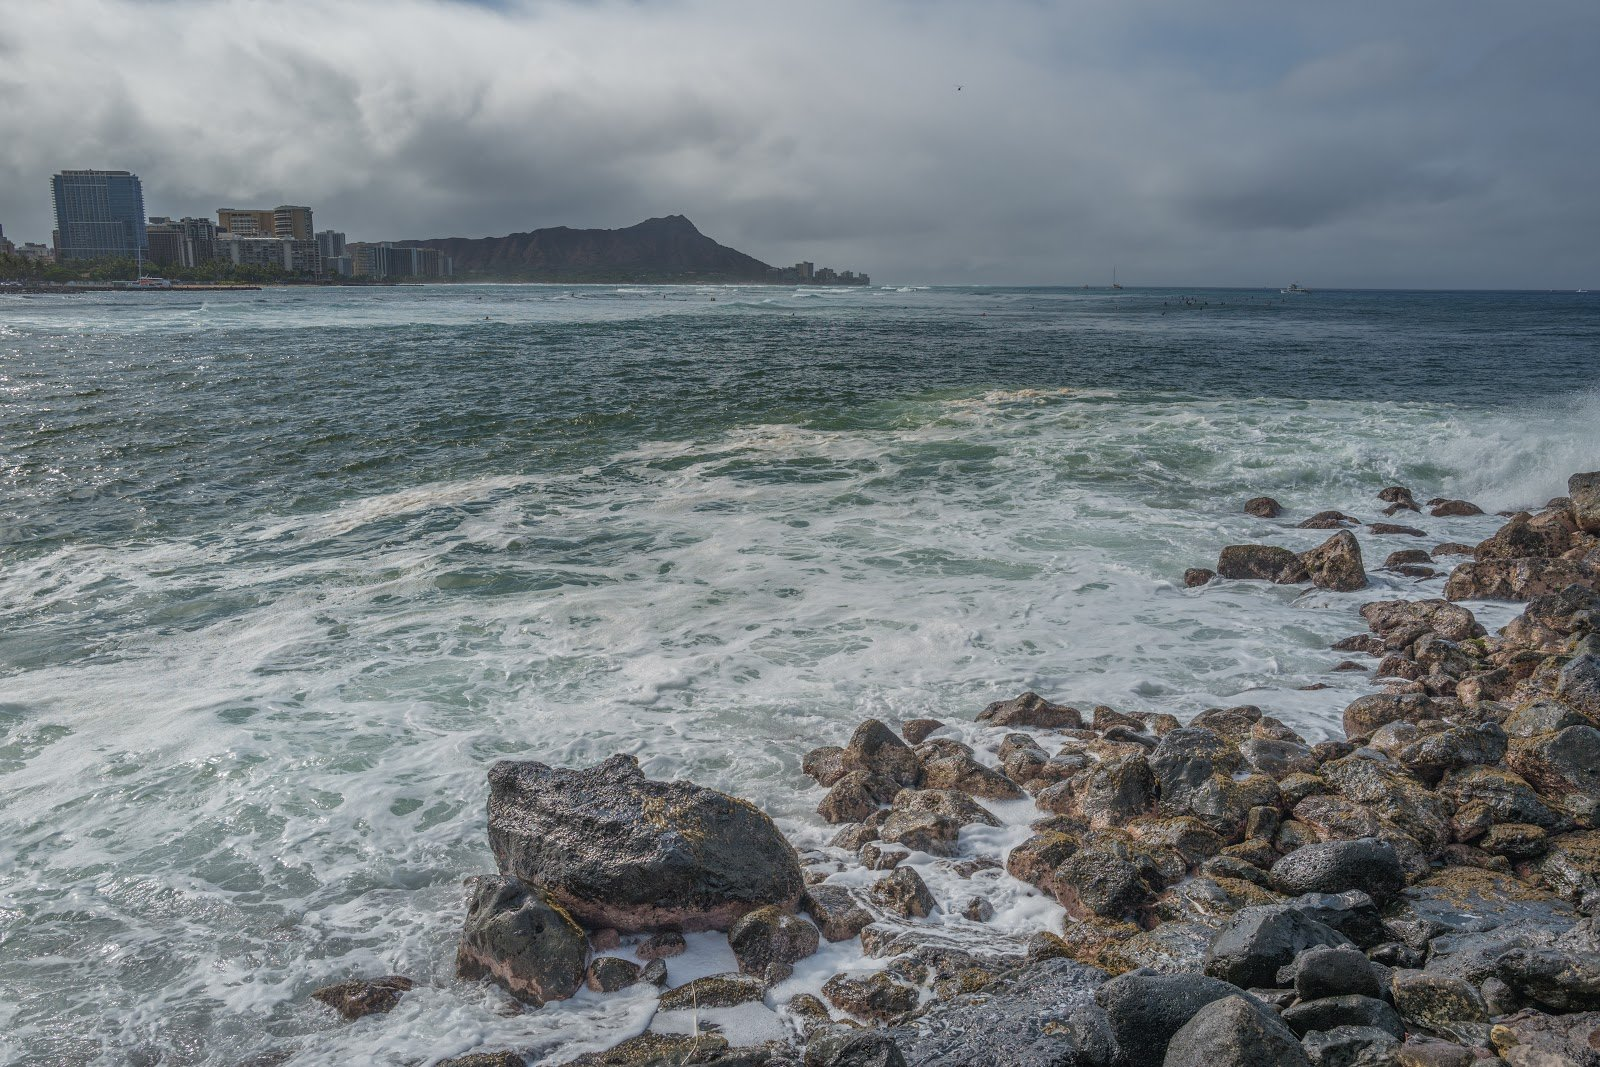 Heavy Rain, Flash Floods Expected to Hit Hawaii as Rainy Season Begins